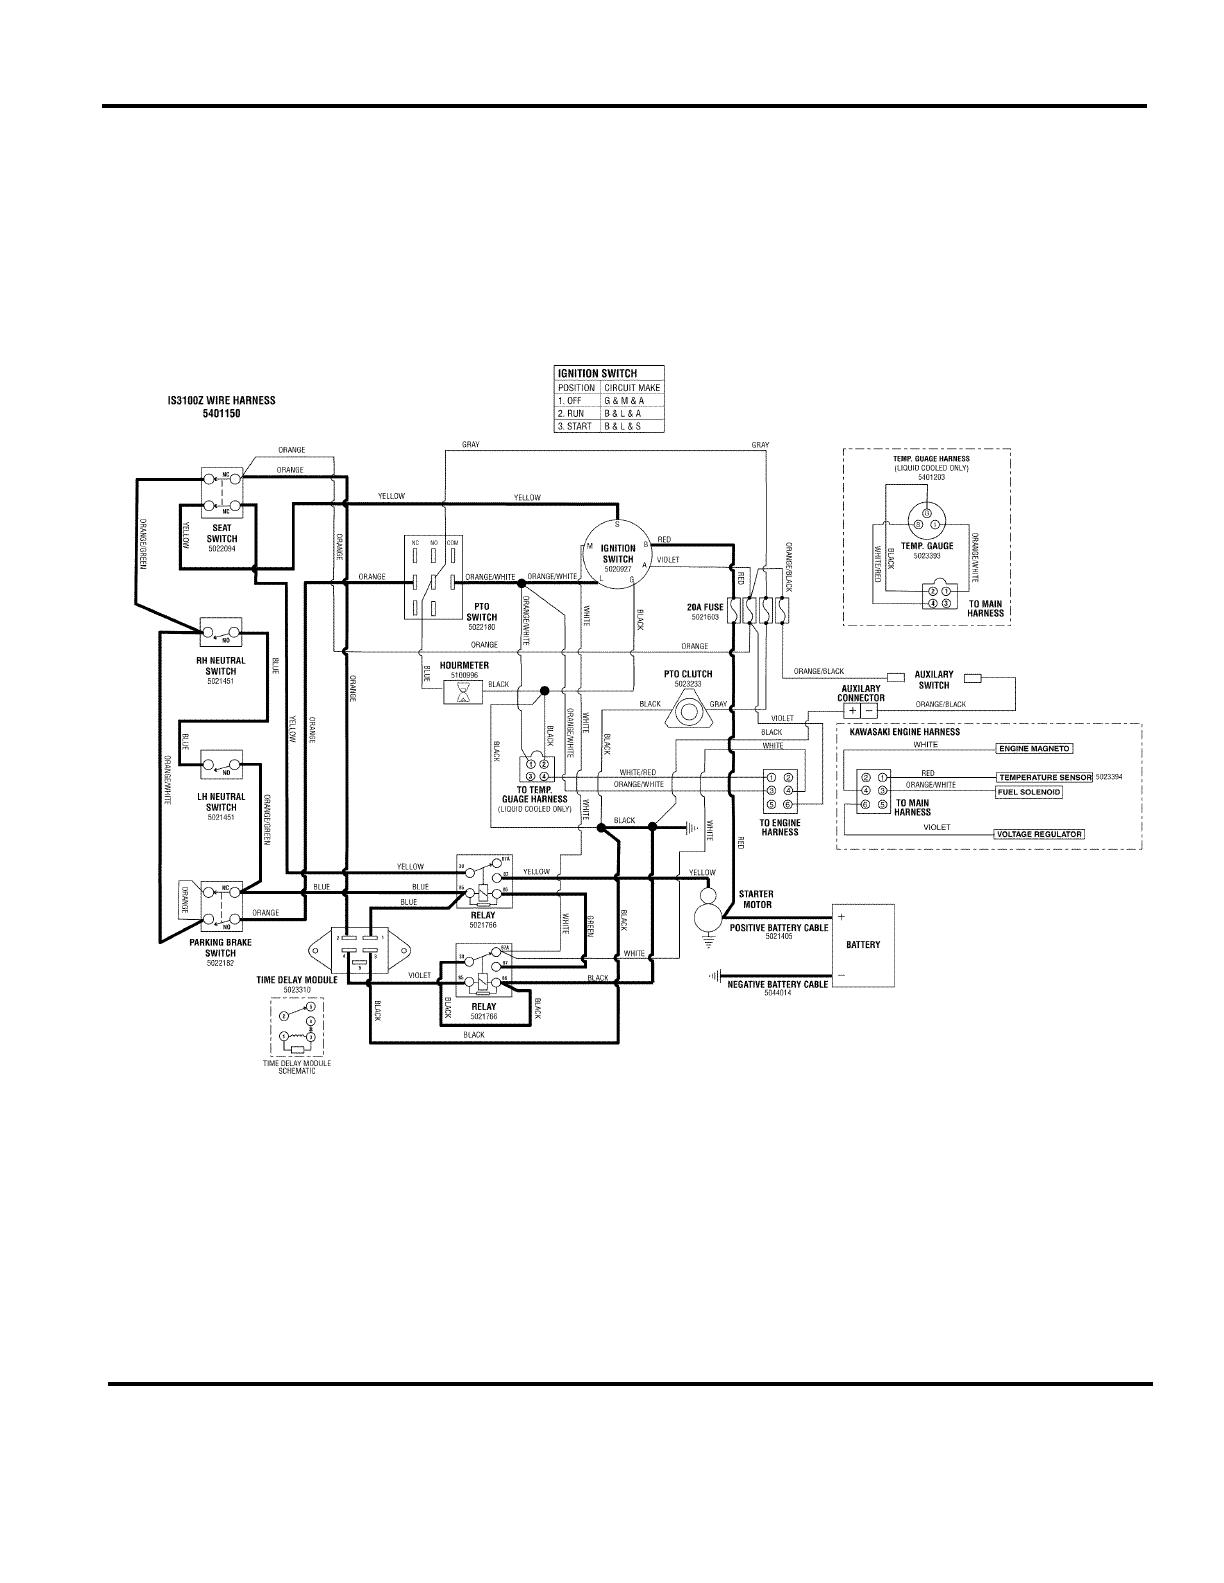 Ferris Wiring Diagram - 10.19.petraoberheit.de • on compressor ladder diagram, chiller ladder diagram, ferris is2000z repair manual, ferris parts, walk-in freezer schematic diagram, basic freezer diagram, ferris wheels diagram, 1968 barracuda electrical diagram, basic ladder diagram, ferris owner's manual, automotive headlight pin diagram, kohler 15.5 engine diagram, marlin 39a parts diagram,